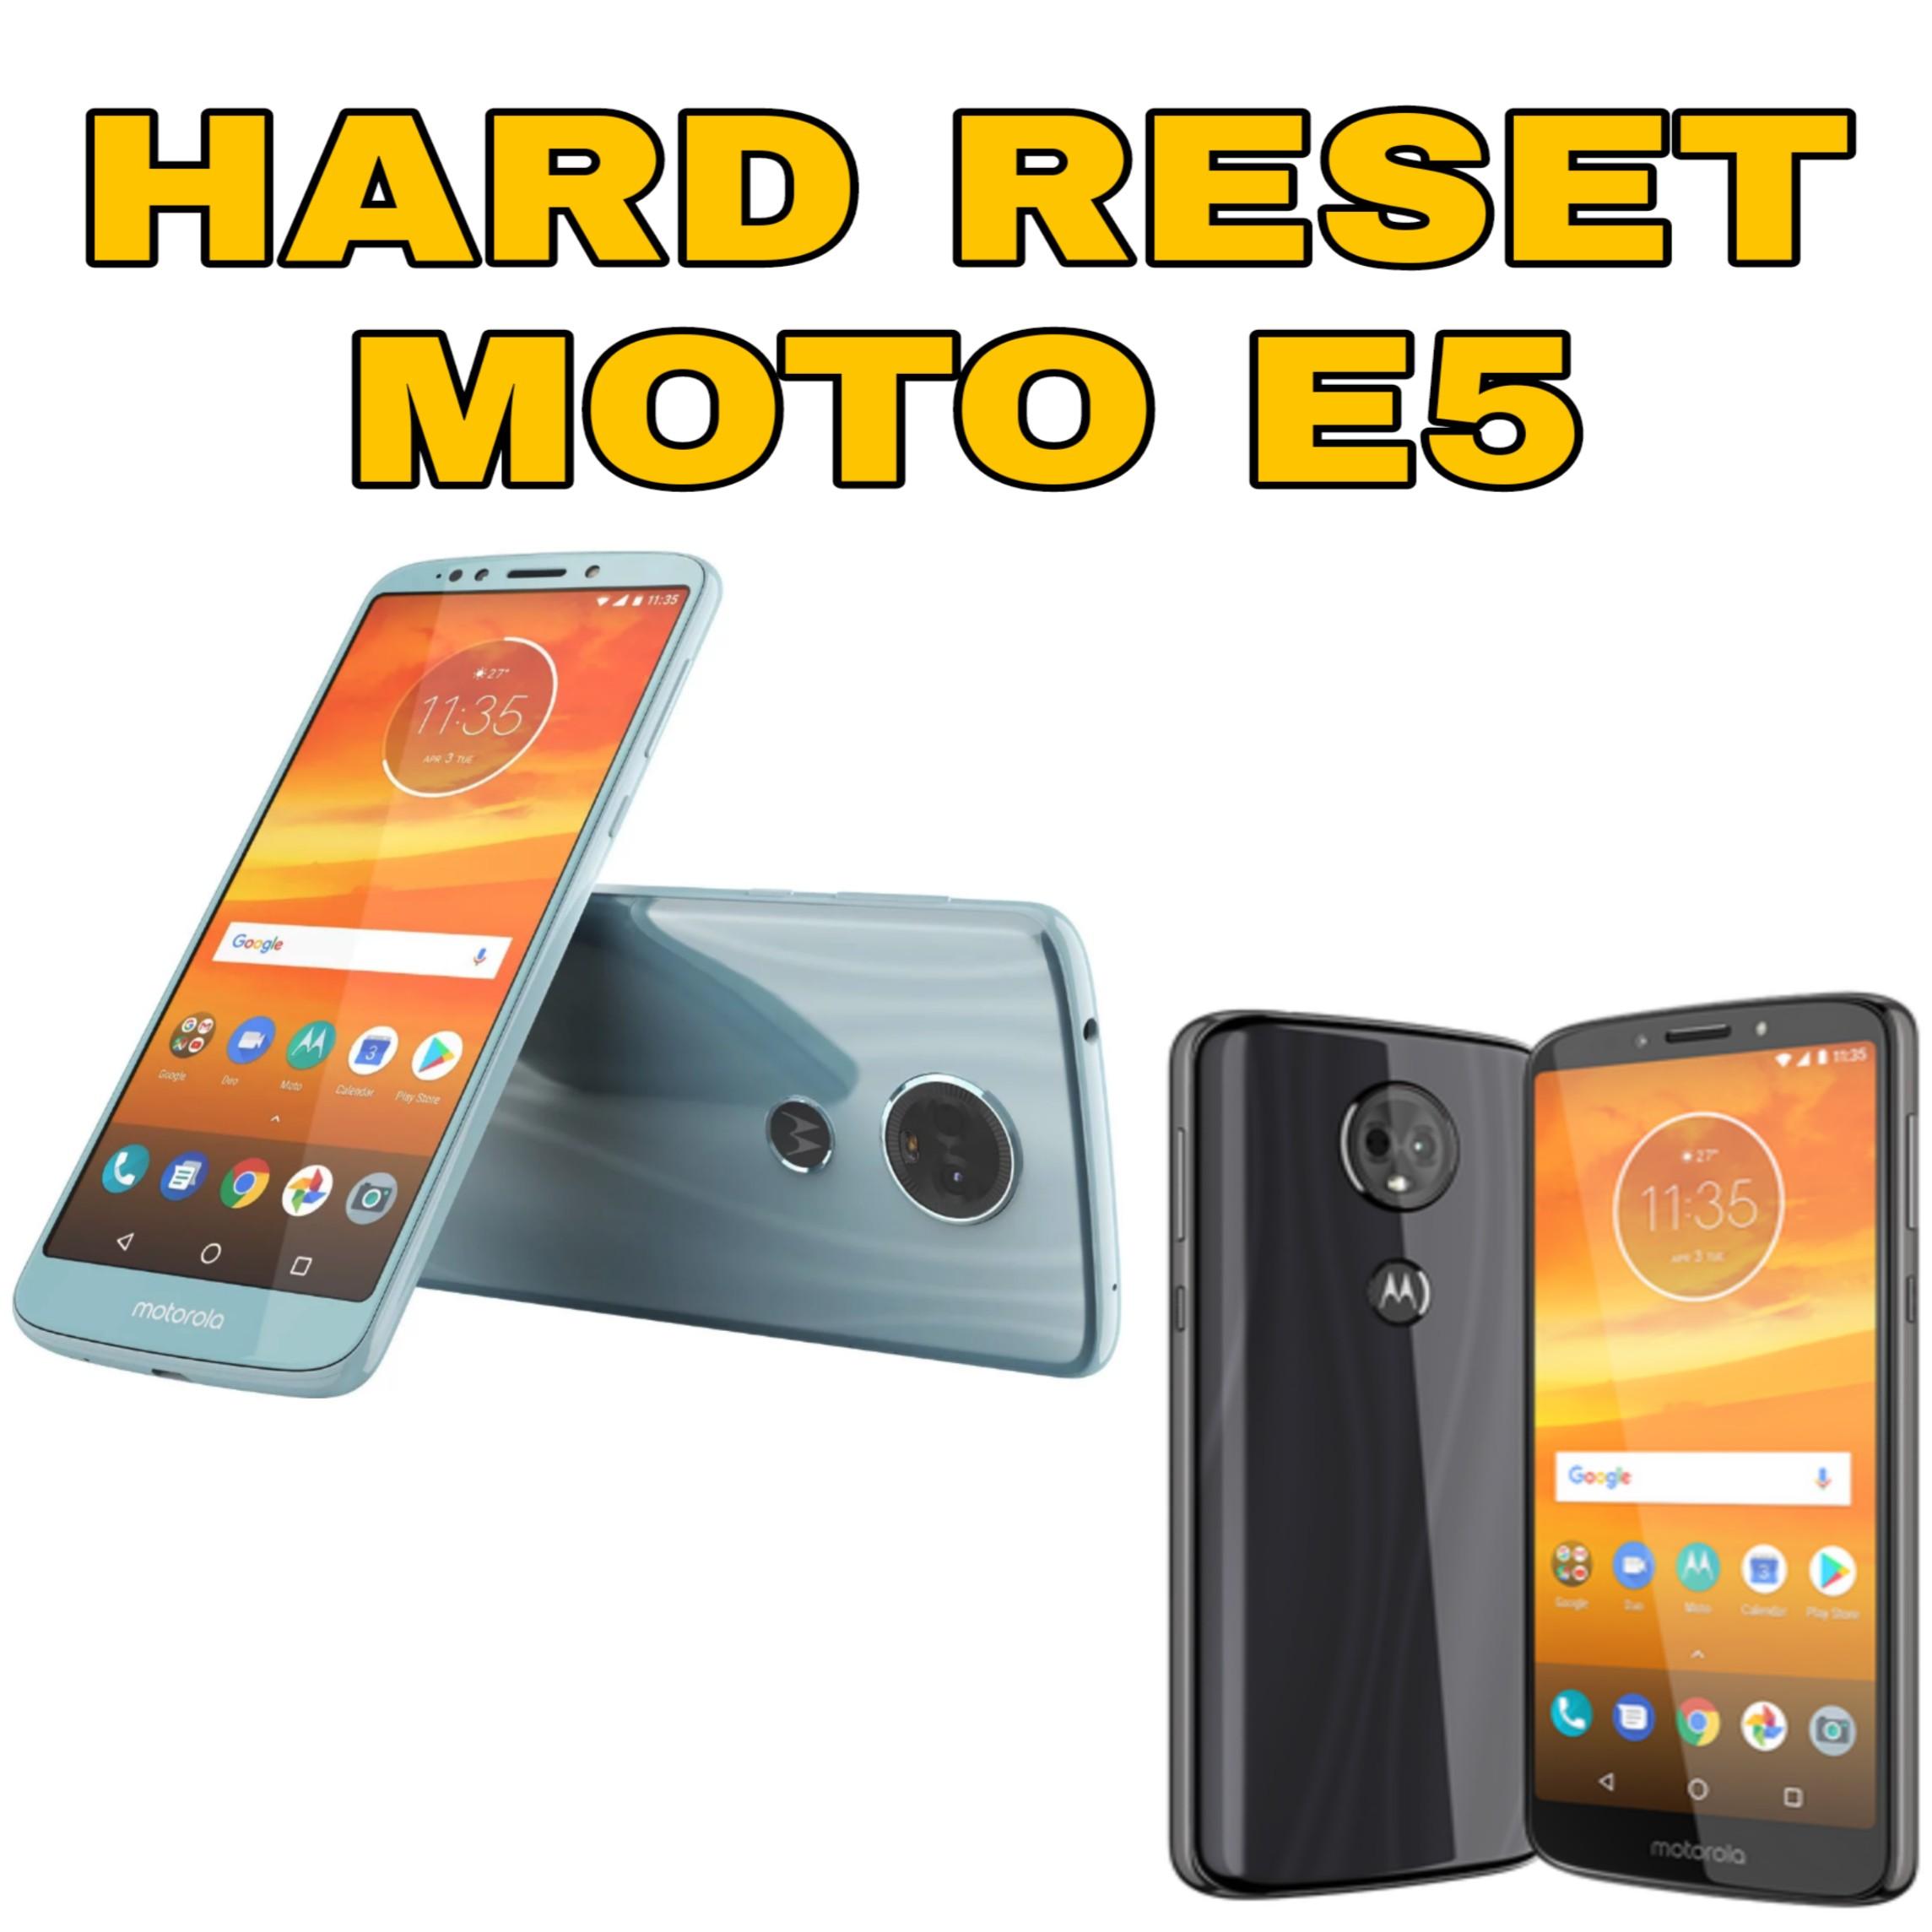 Hard reset Moto e5 Play, formatear moto e5